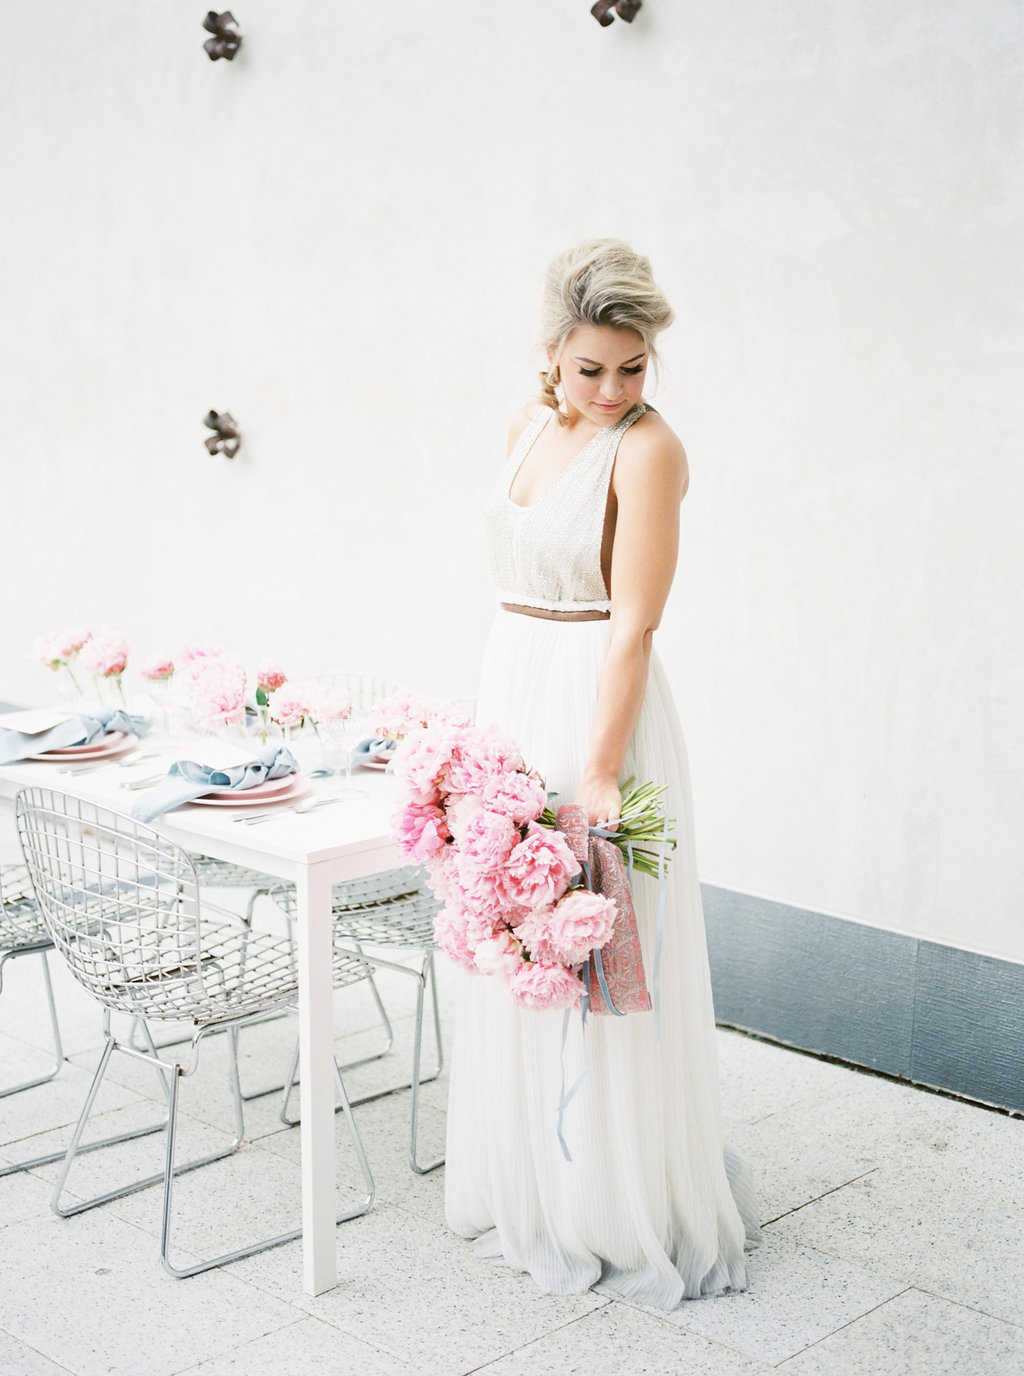 bridal wedding inspiration - photo by Awake Photography http://ruffledblog.com/sweet-peony-bridal-inspiration